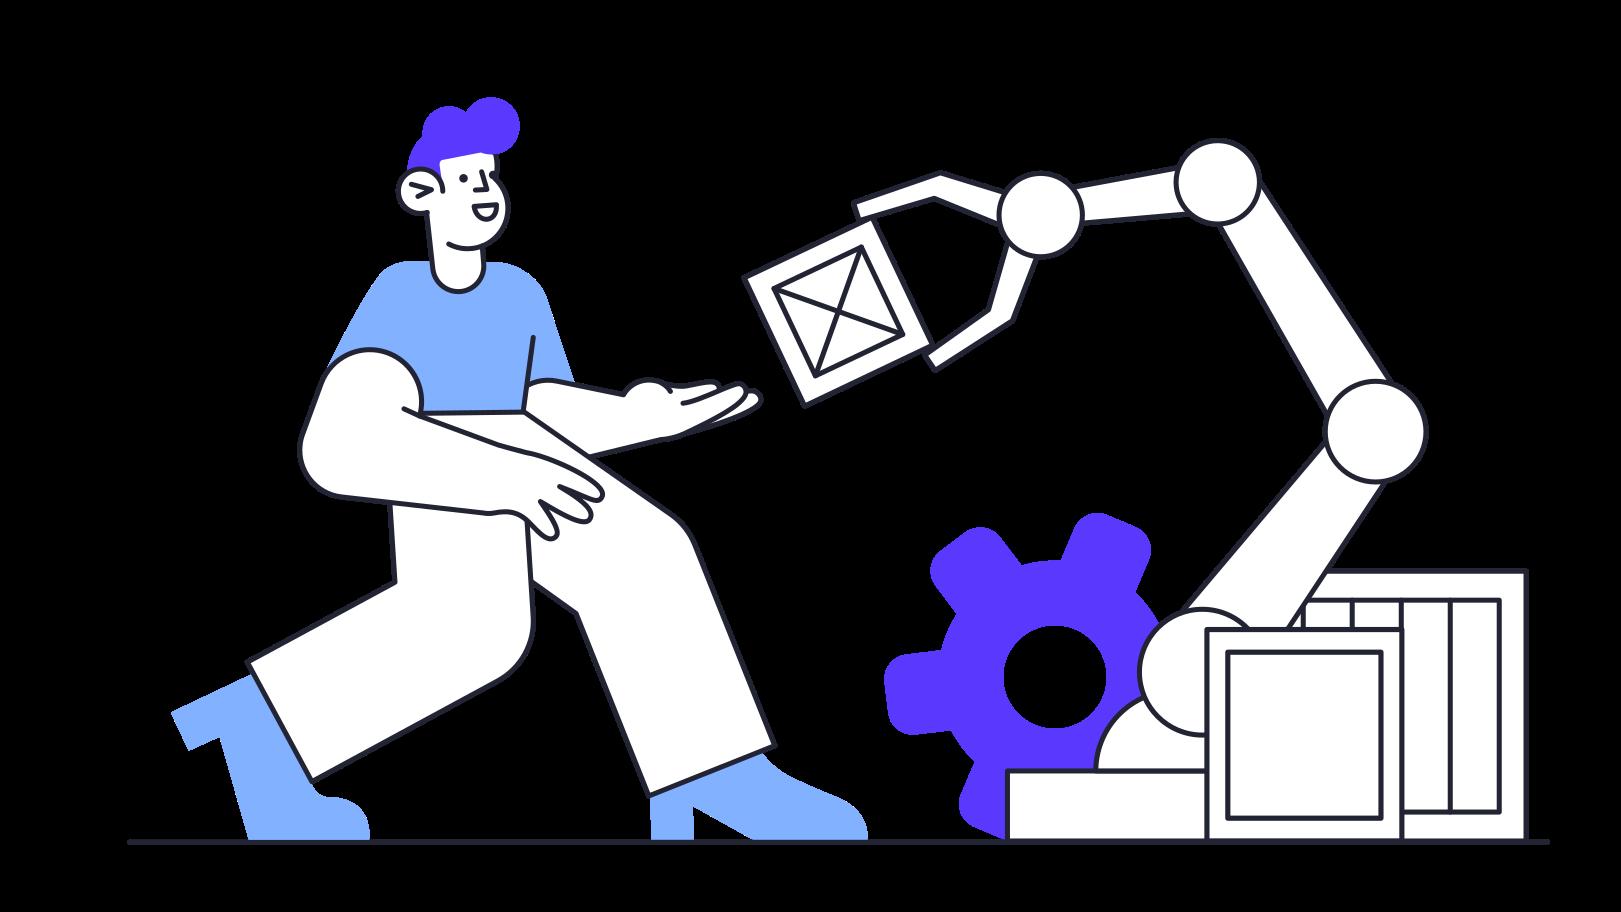 Automatização Clipart illustration in PNG, SVG